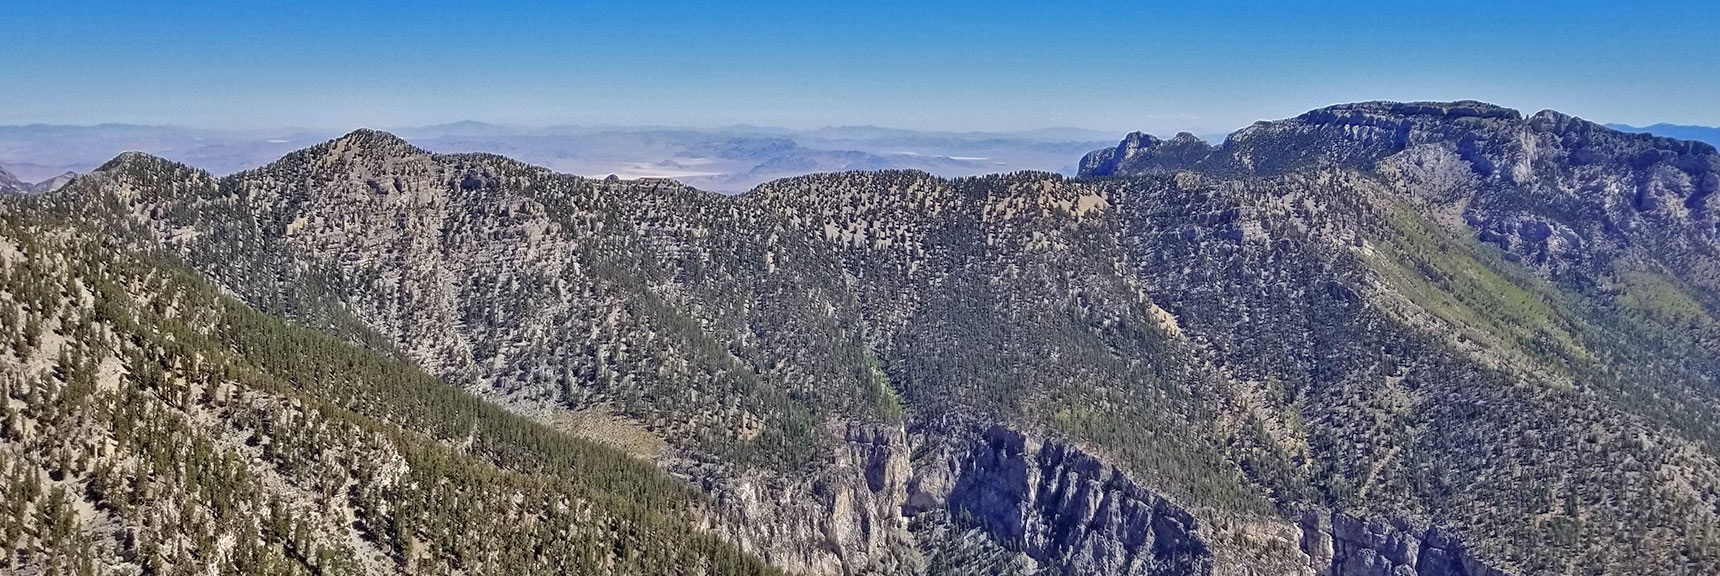 Lee Peak to Mummy Mountain from Kyle Canyon Upper South Ridge | Griffith Peak & Charleston Peak Circuit Run, Spring Mountains, Nevada